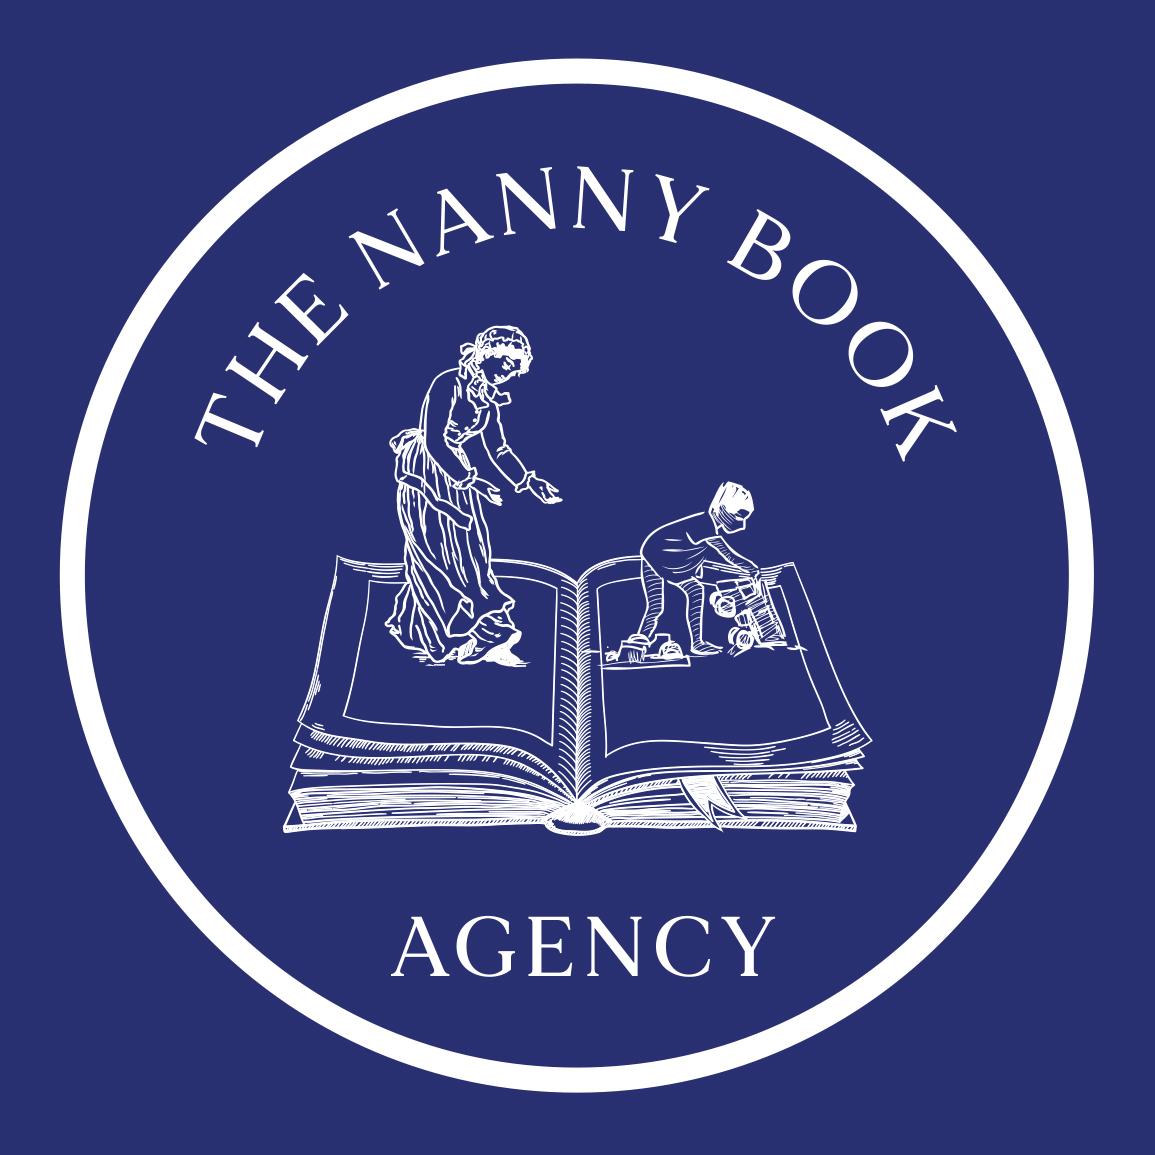 The Nanny Book Agency 's logo